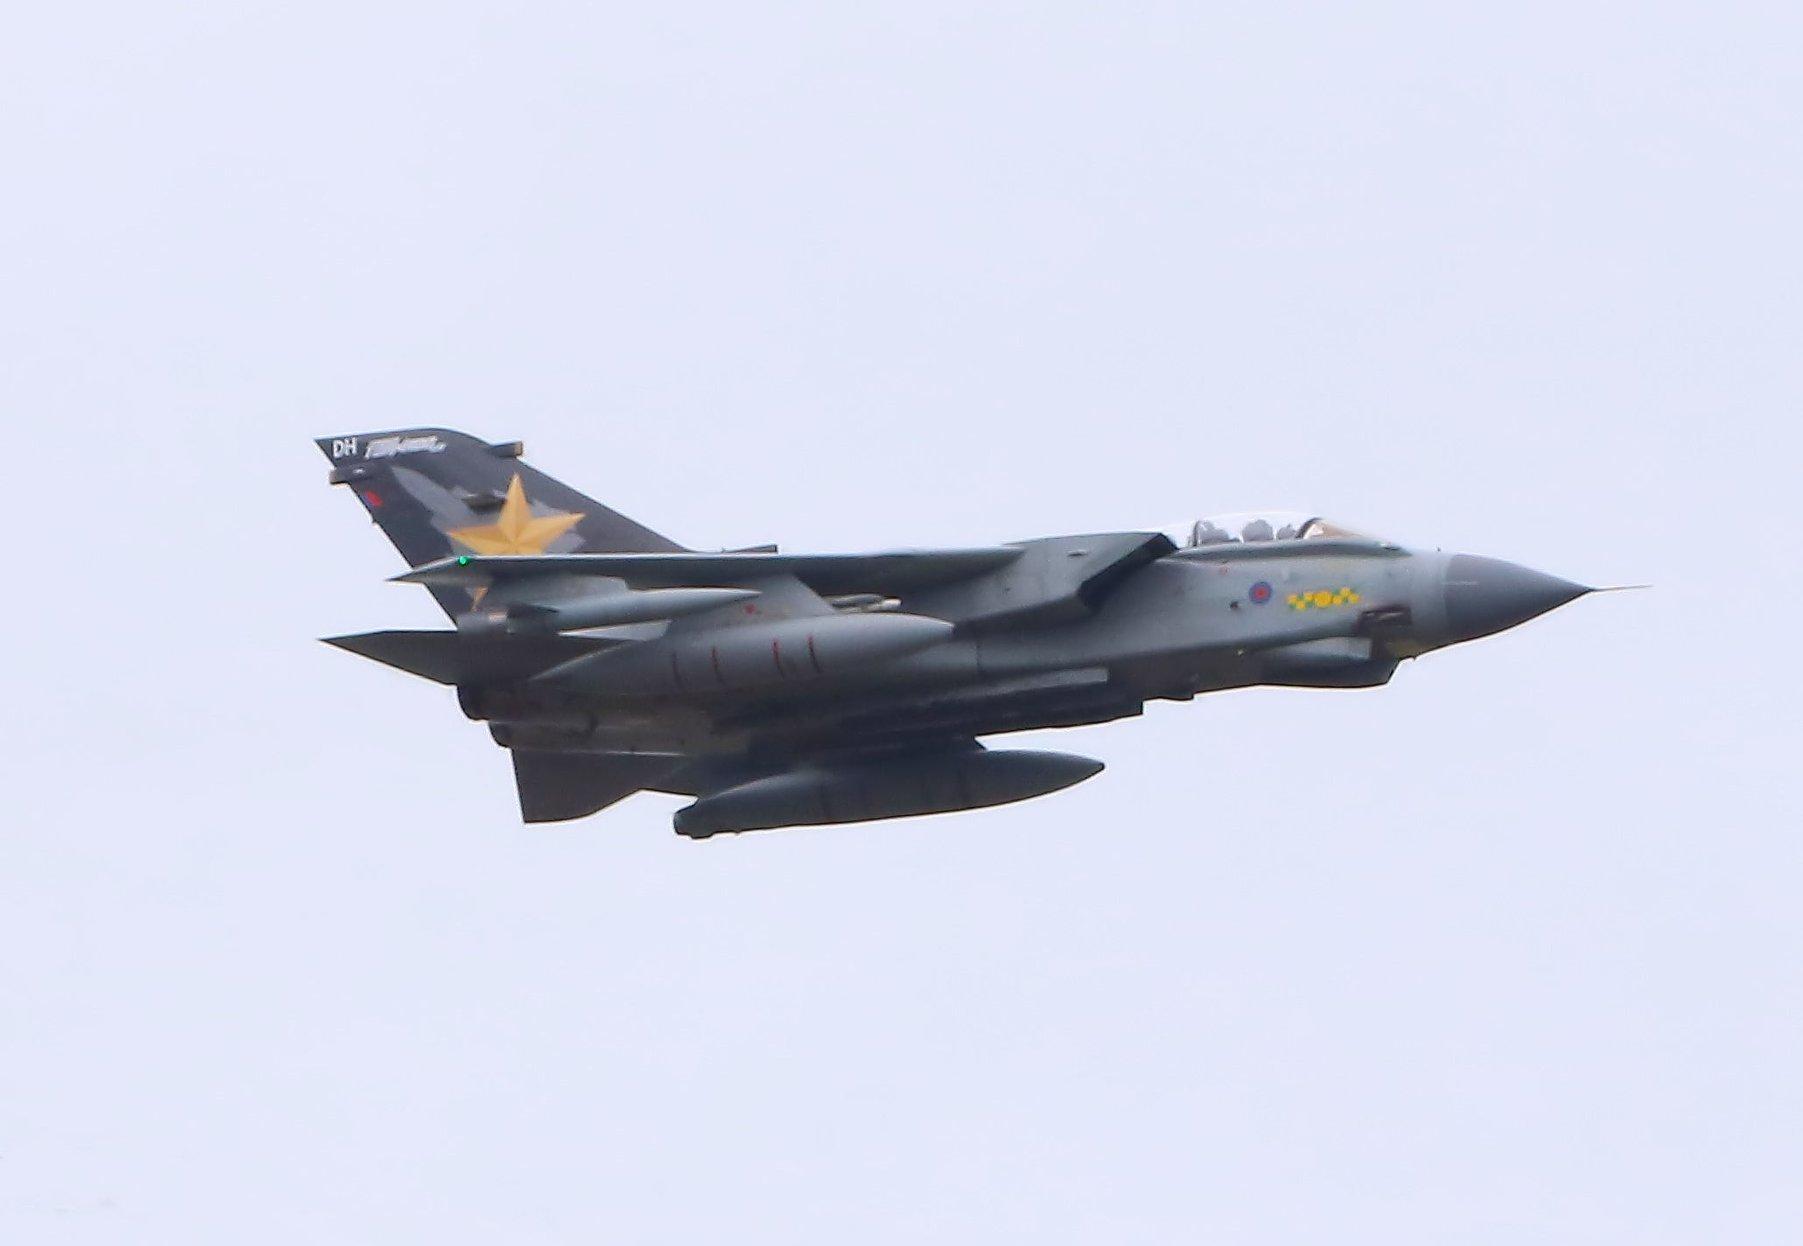 The 'Gold Star' Tornado (Image: John Edwards)